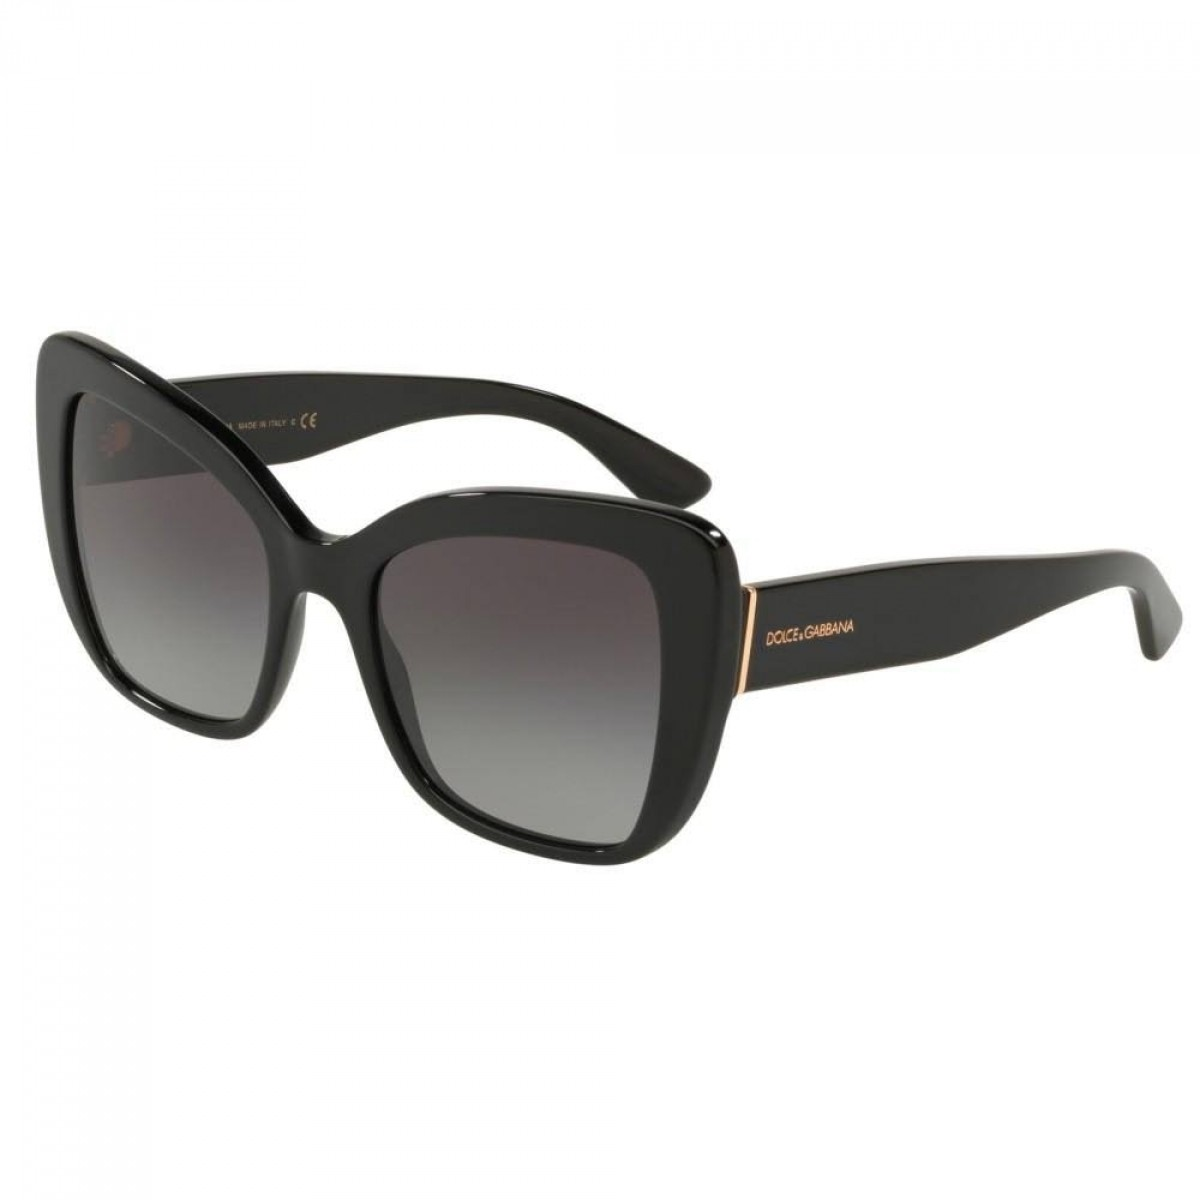 Dolce & Gabbana 4348 501/8G 54, 129,99€, Occhiali a forma